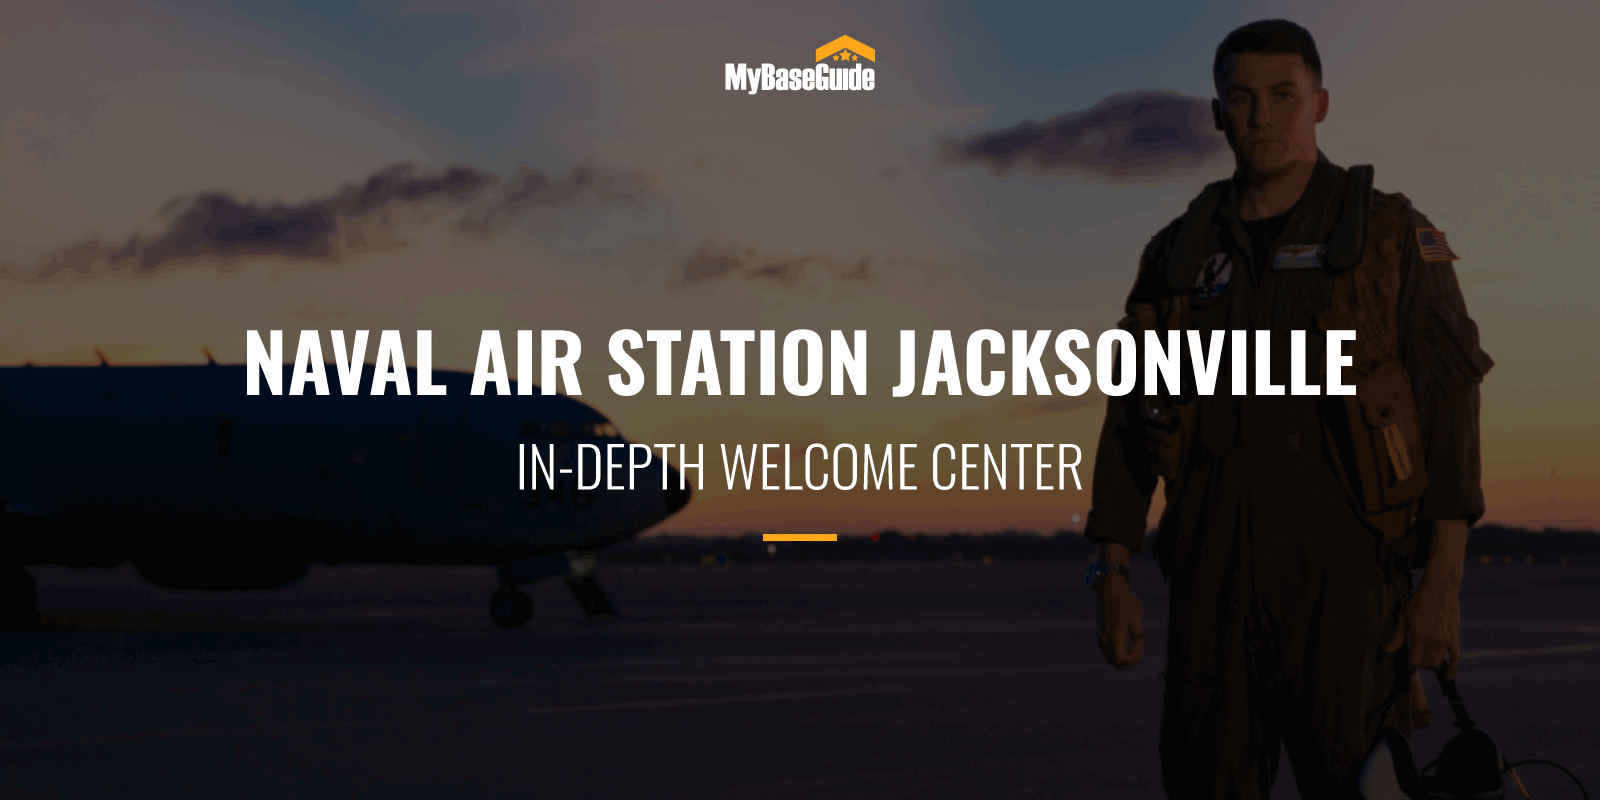 NAS Jacksonville Welcome Center